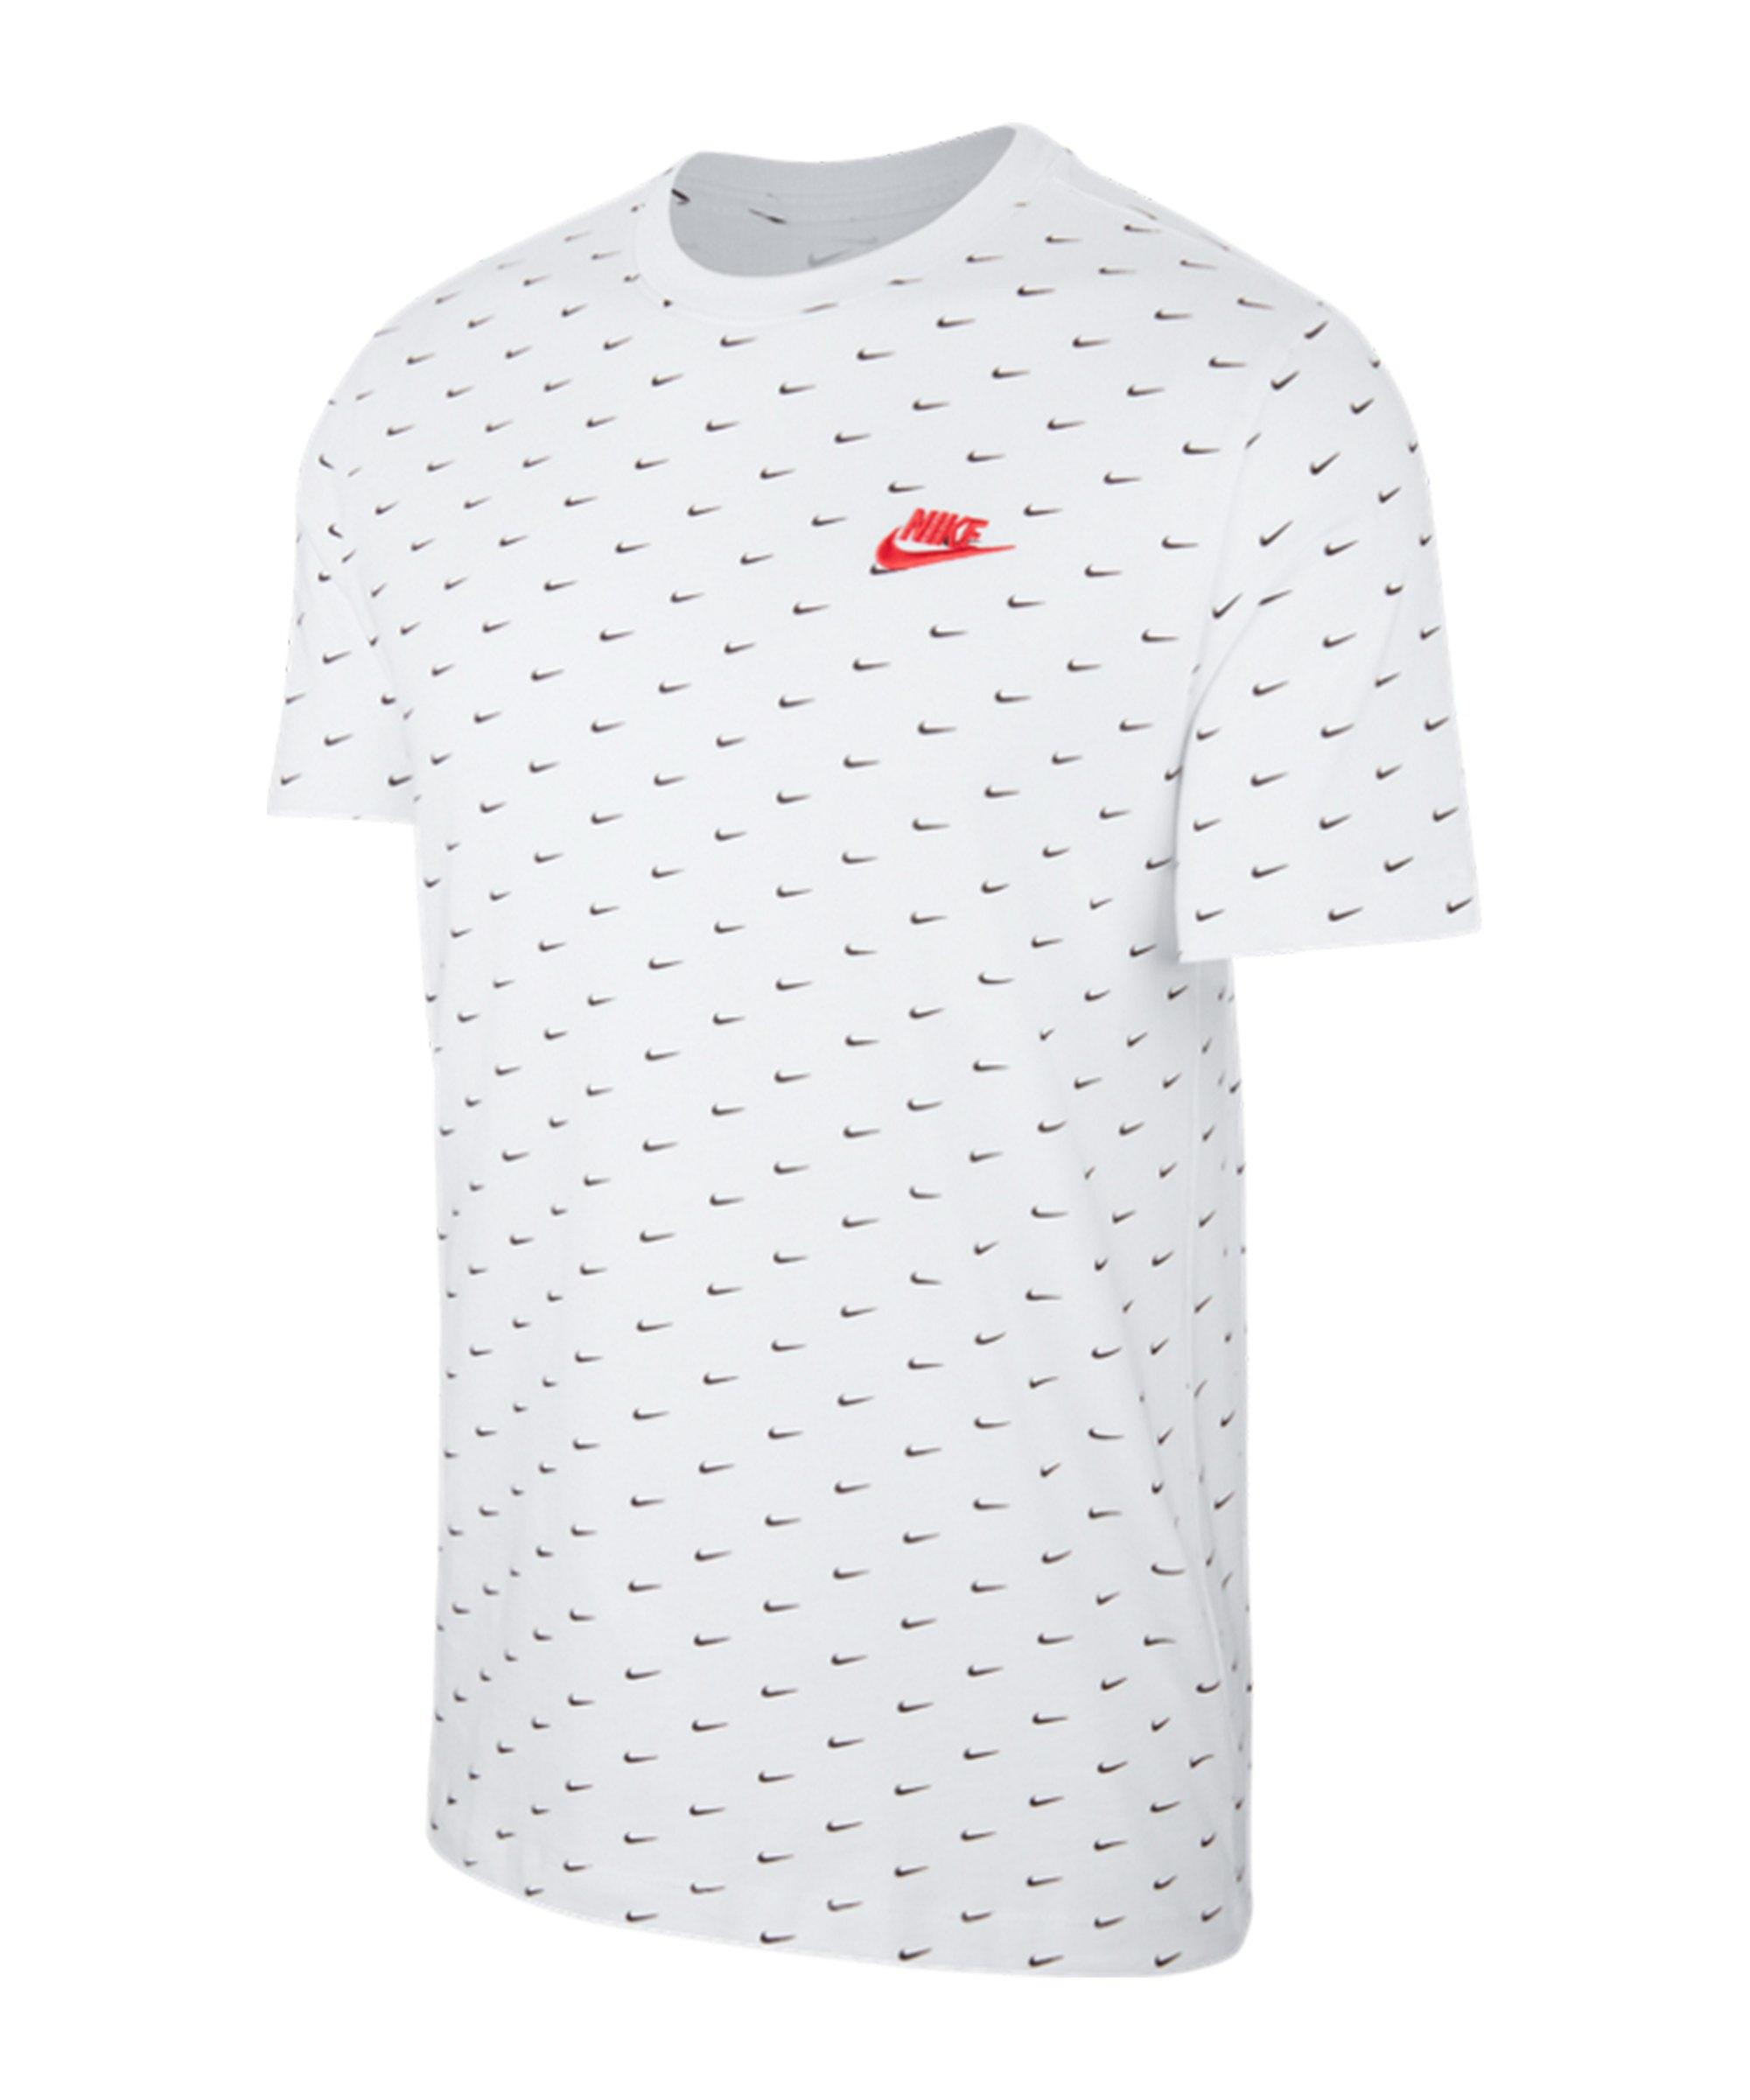 Nike Sportswear Mini Swoosh T-Shirt Weiss F102 - weiss